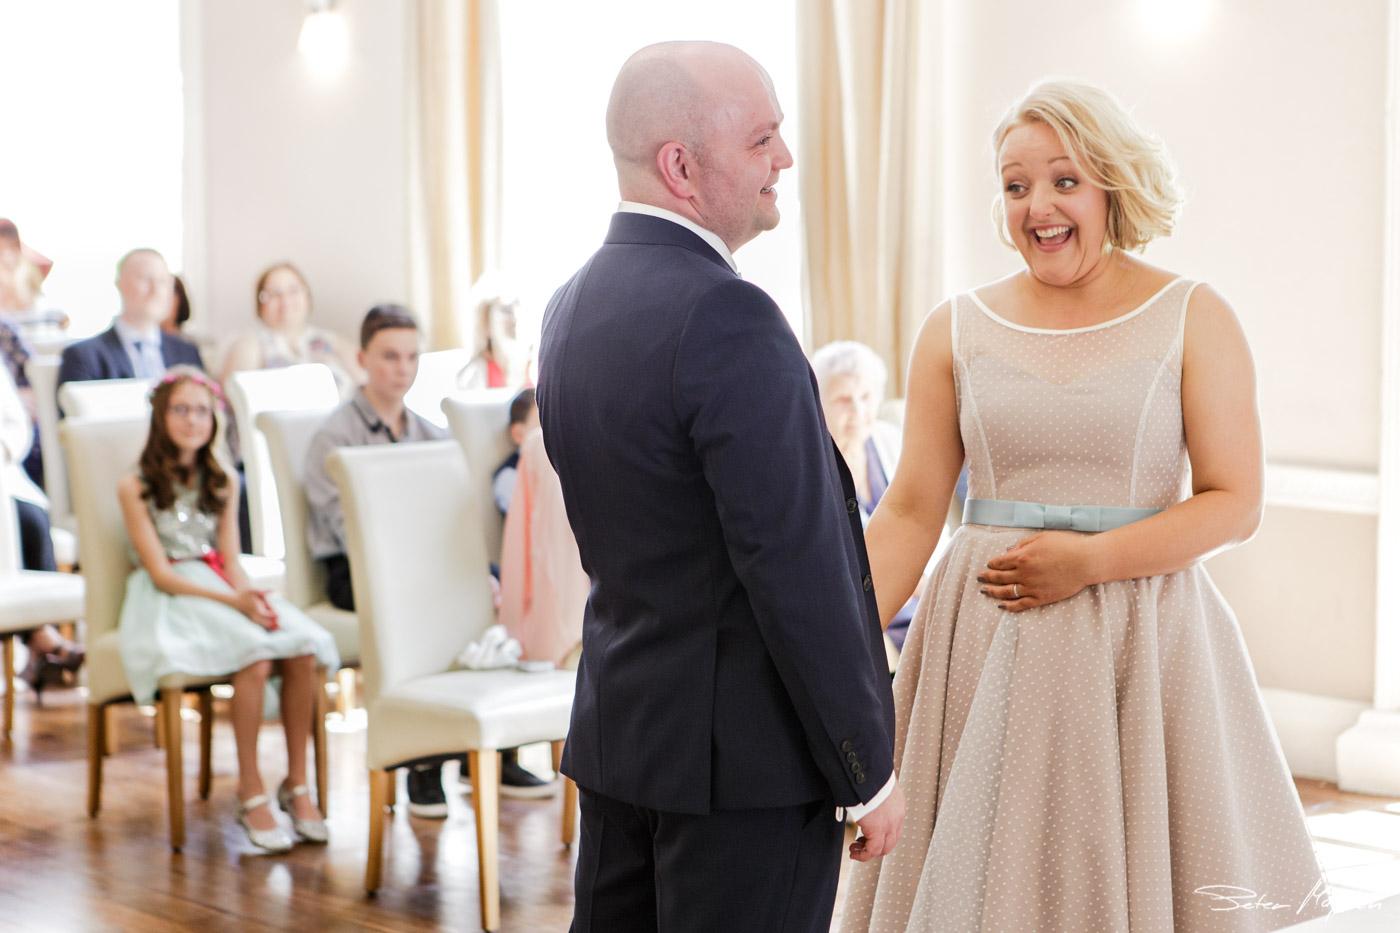 Colwick-hall-wedding-photography-20.jpg